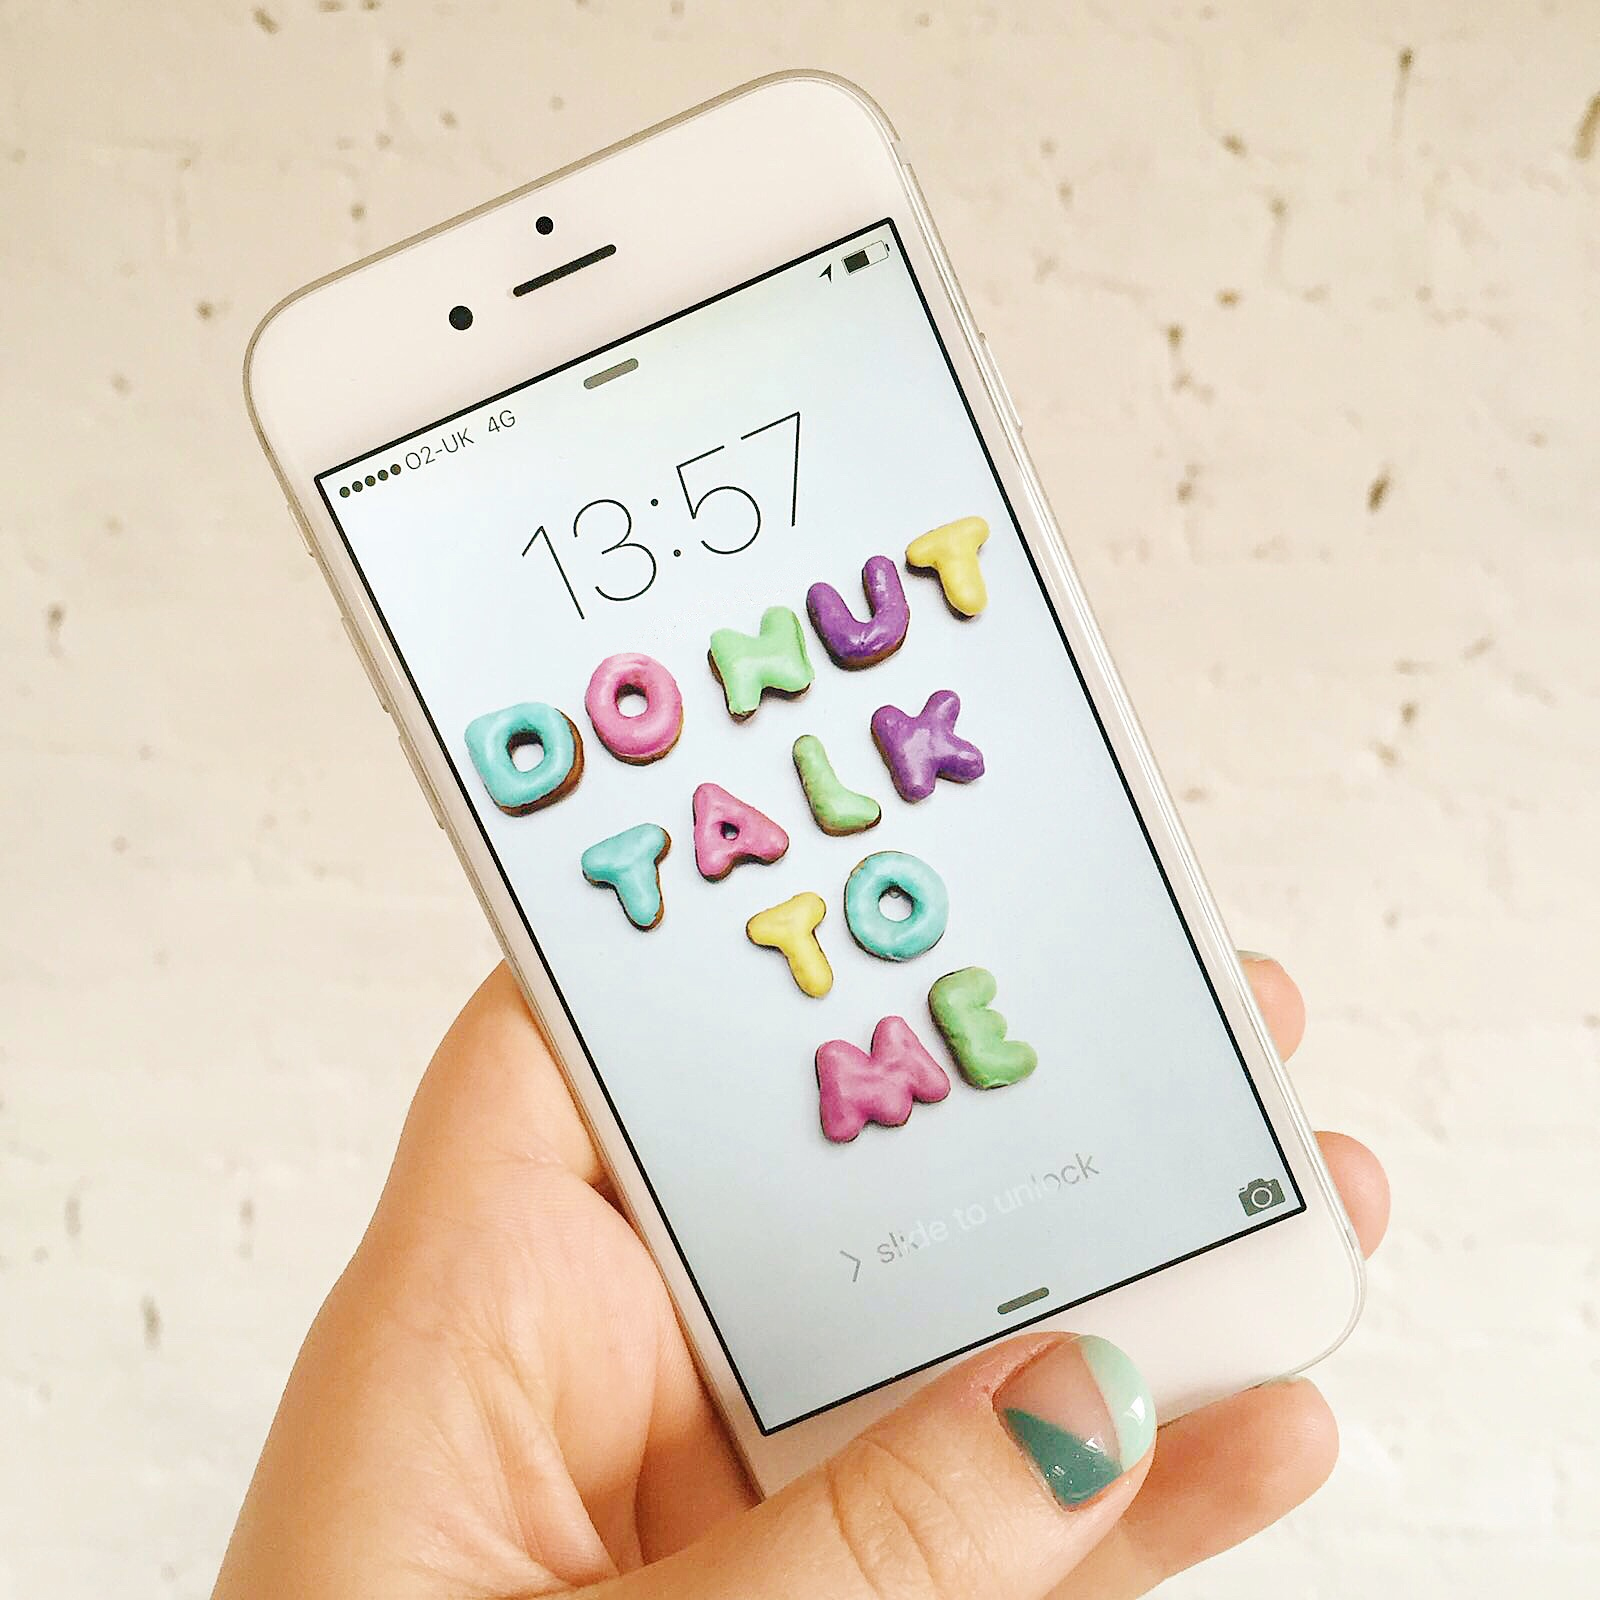 Donut-Talk-To-Me-iPhone-Wallpaper.jpg